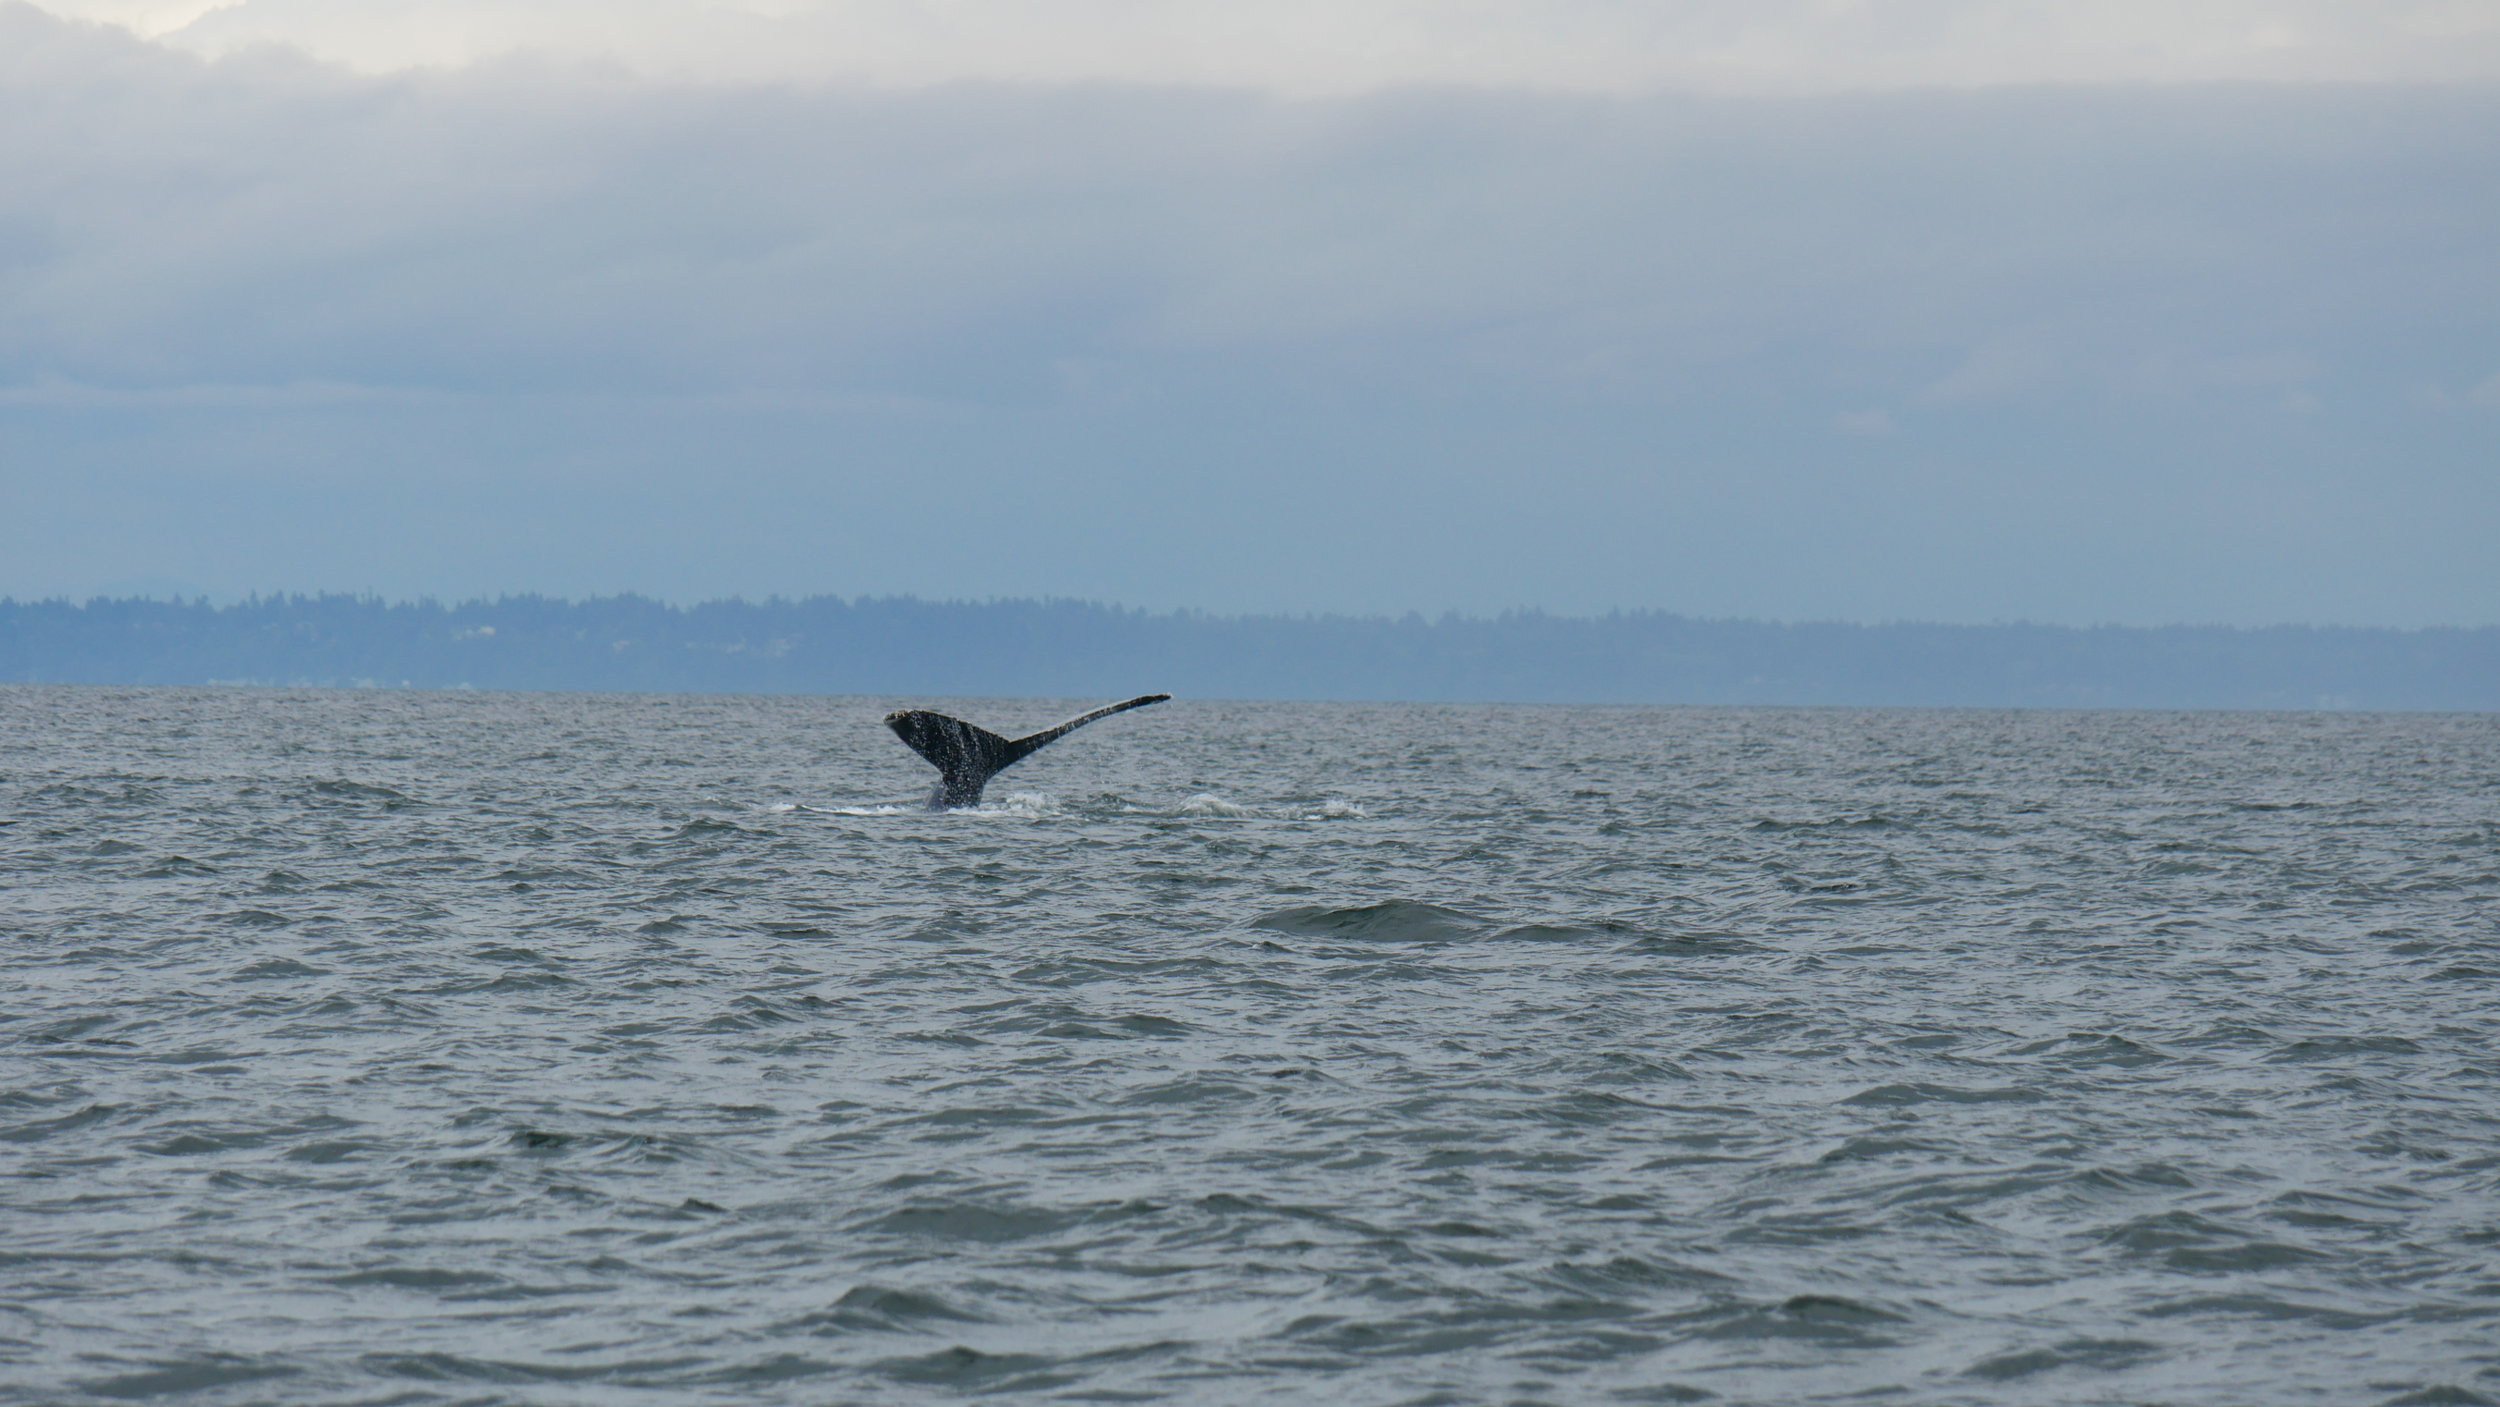 Humpback fluke. Photo by Jilann Lechner Campbell (3:30).